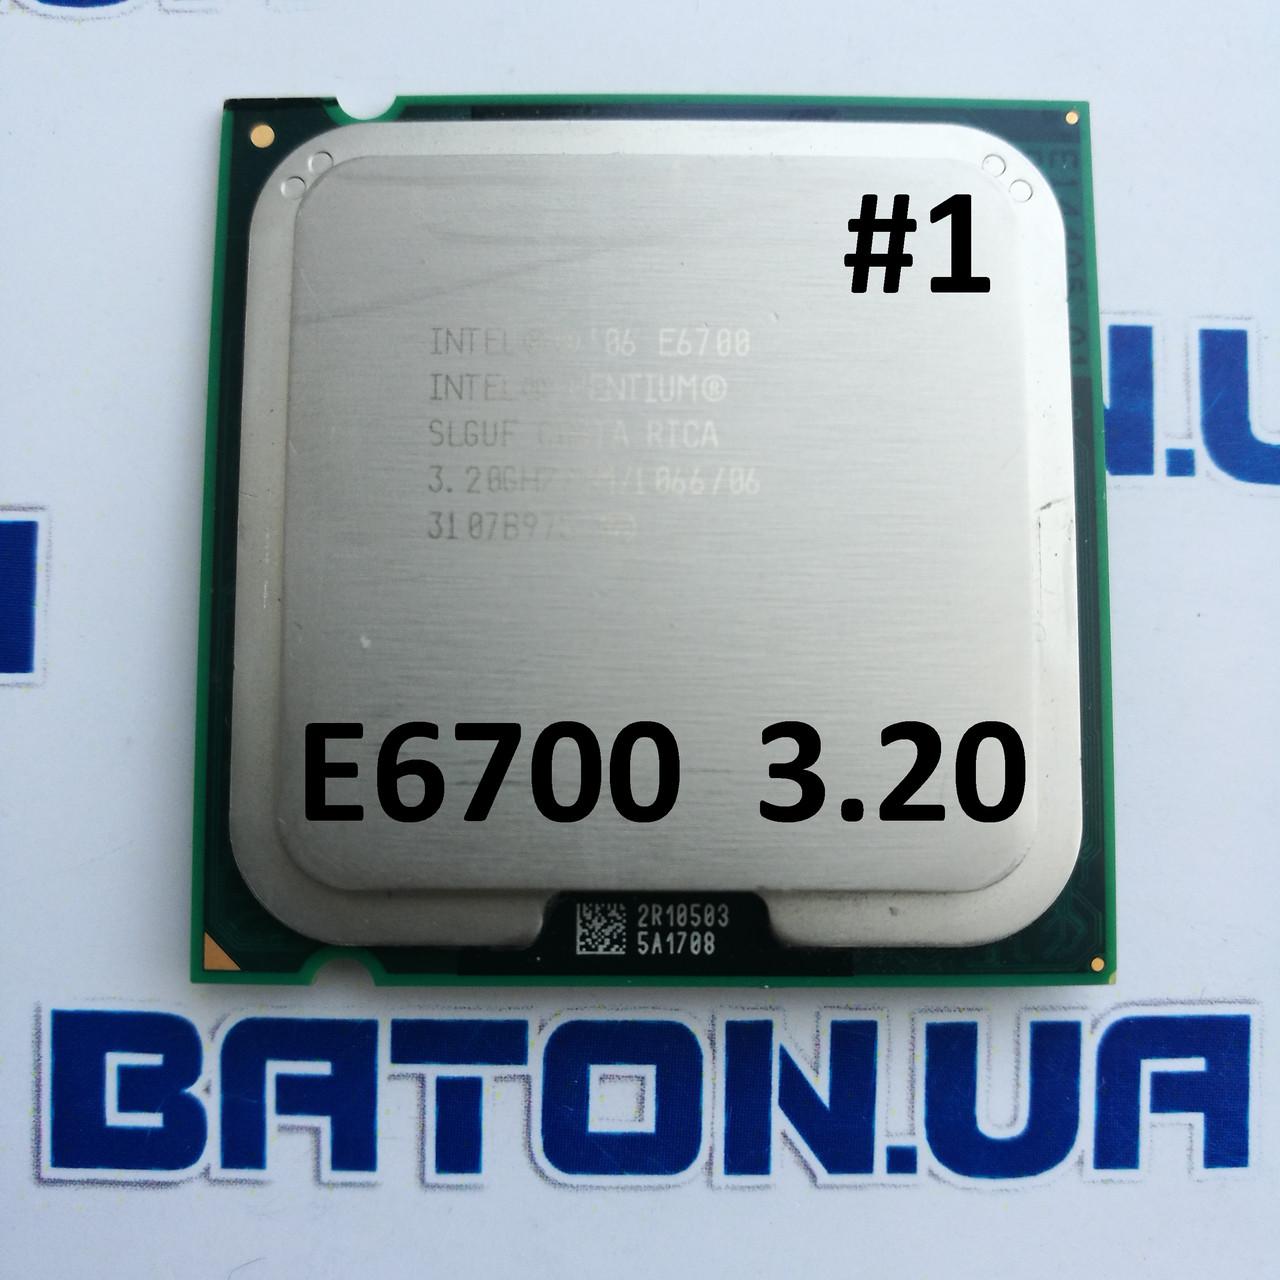 Процессор ЛОТ#1 Intel® Pentium® E6700 3.20GHz 2M Cache 1066 MHz FSB Гарантия + Термопаста